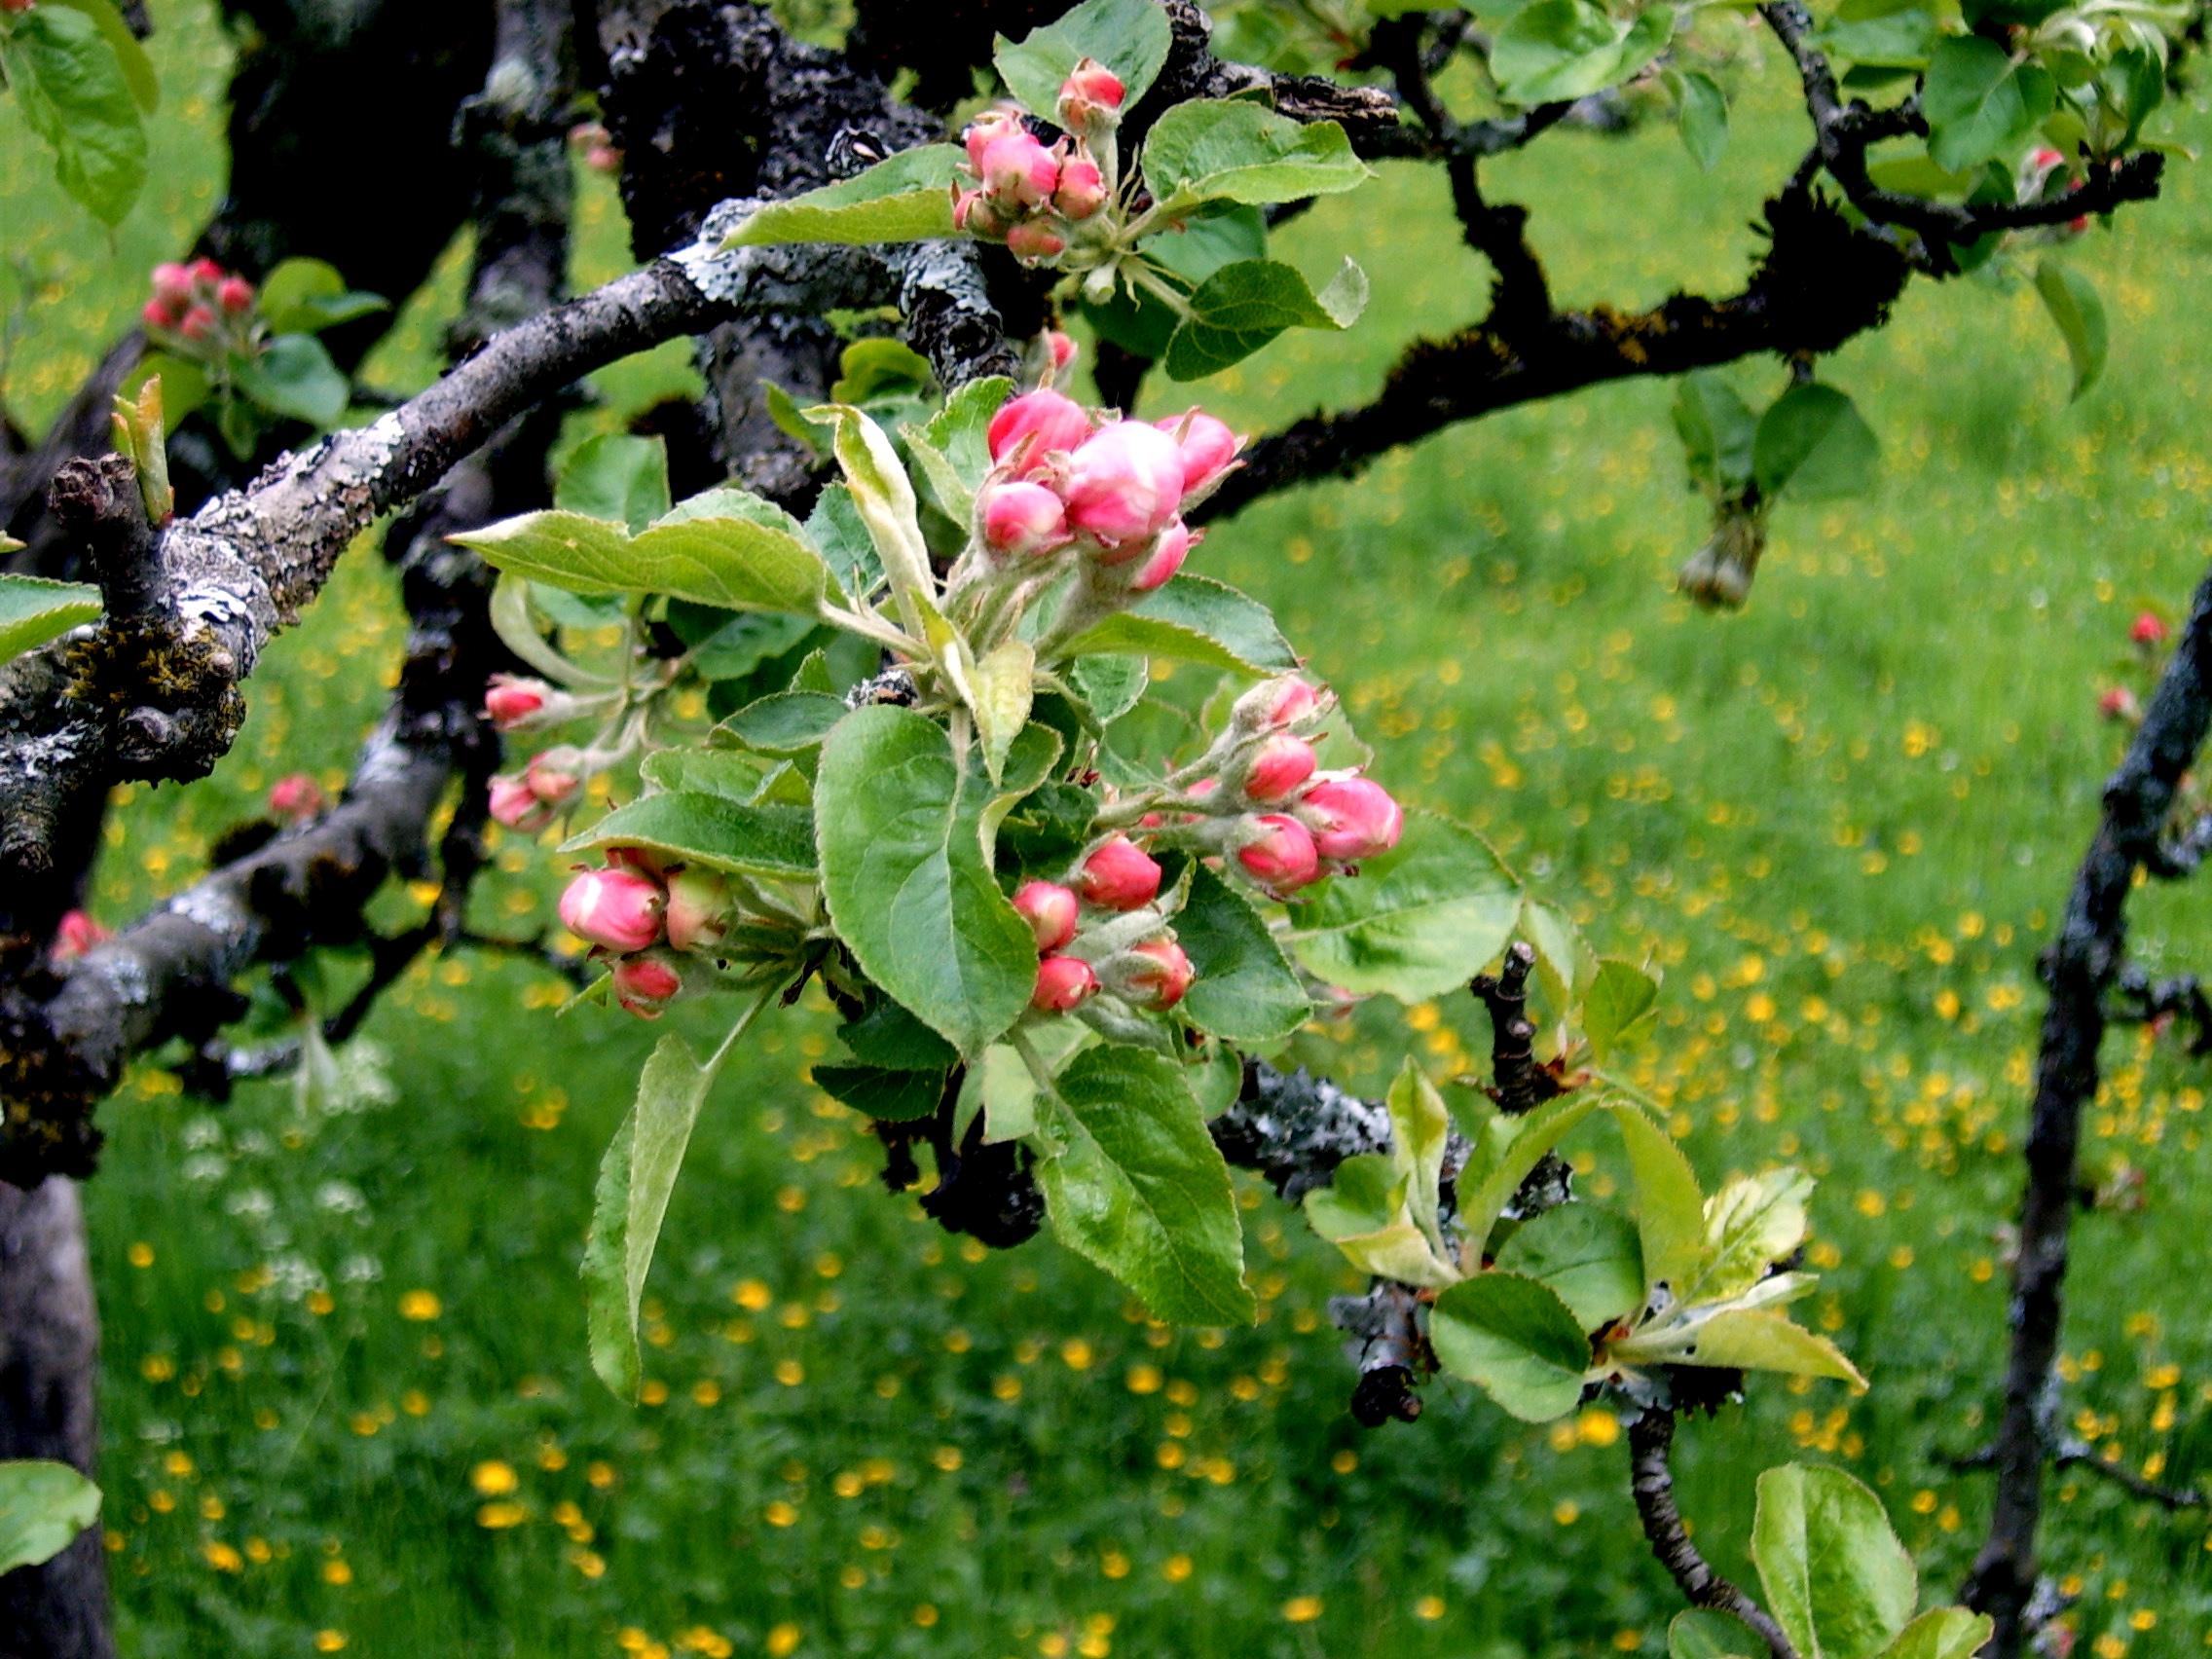 File:Apple tree.jpg - Wikipedia